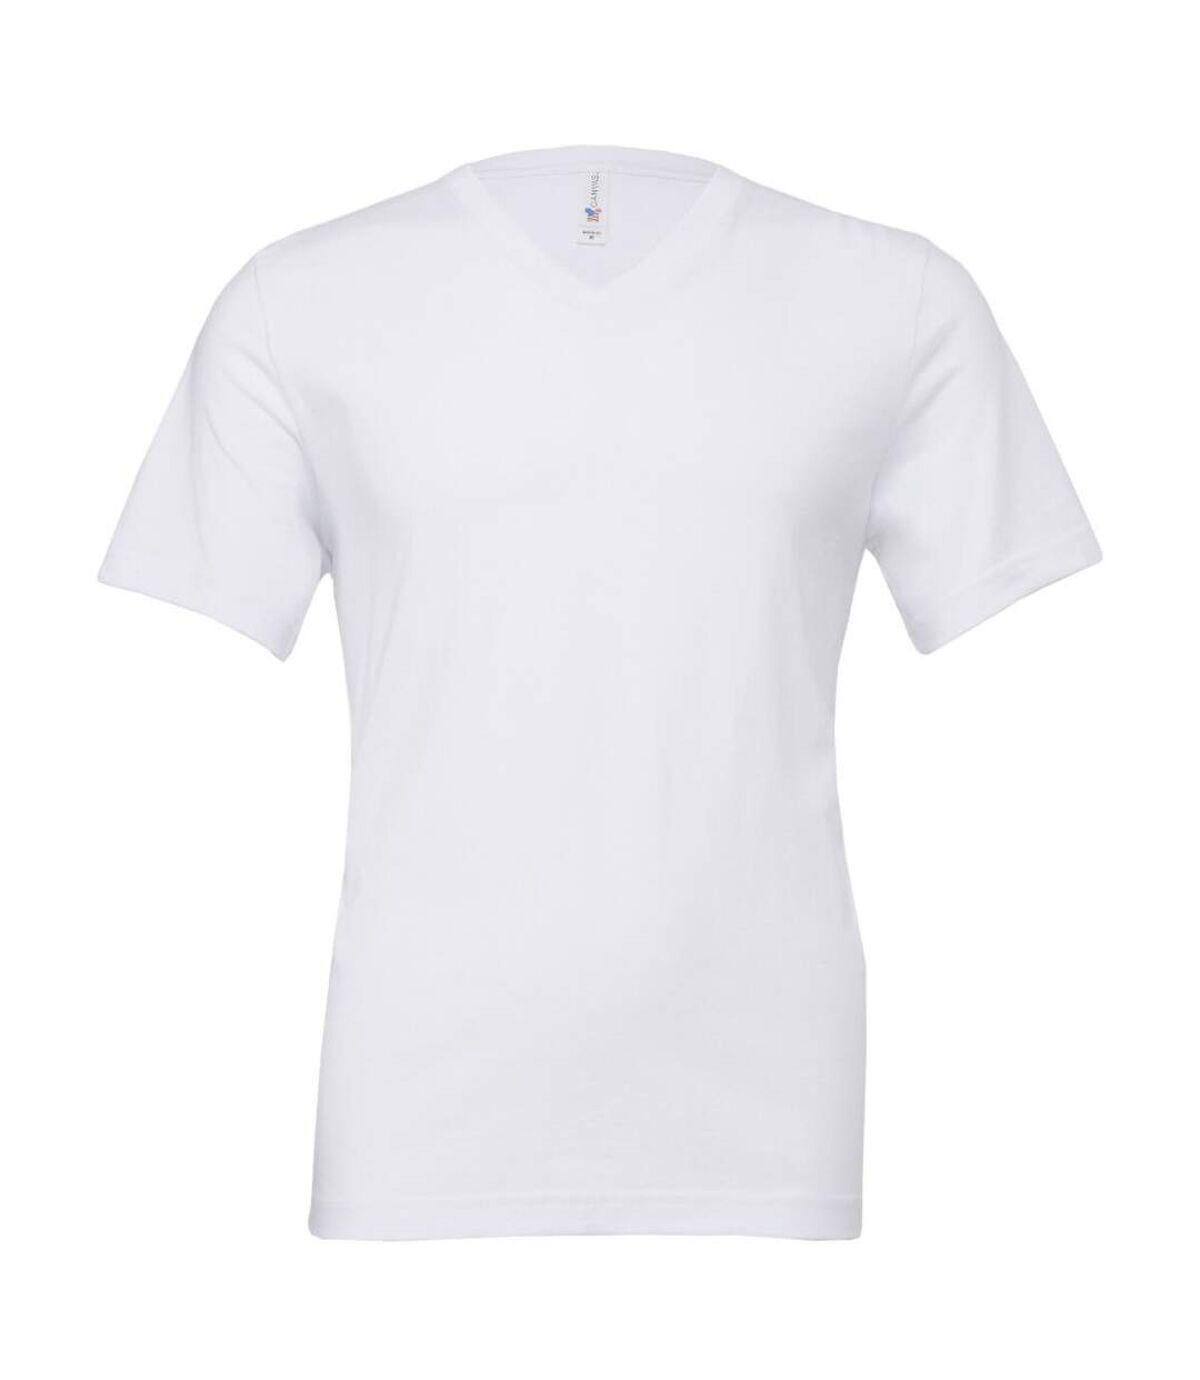 Canvas Mens Jersey Short Sleeve V-Neck T-Shirt (Navy Blue) - UTBC2595